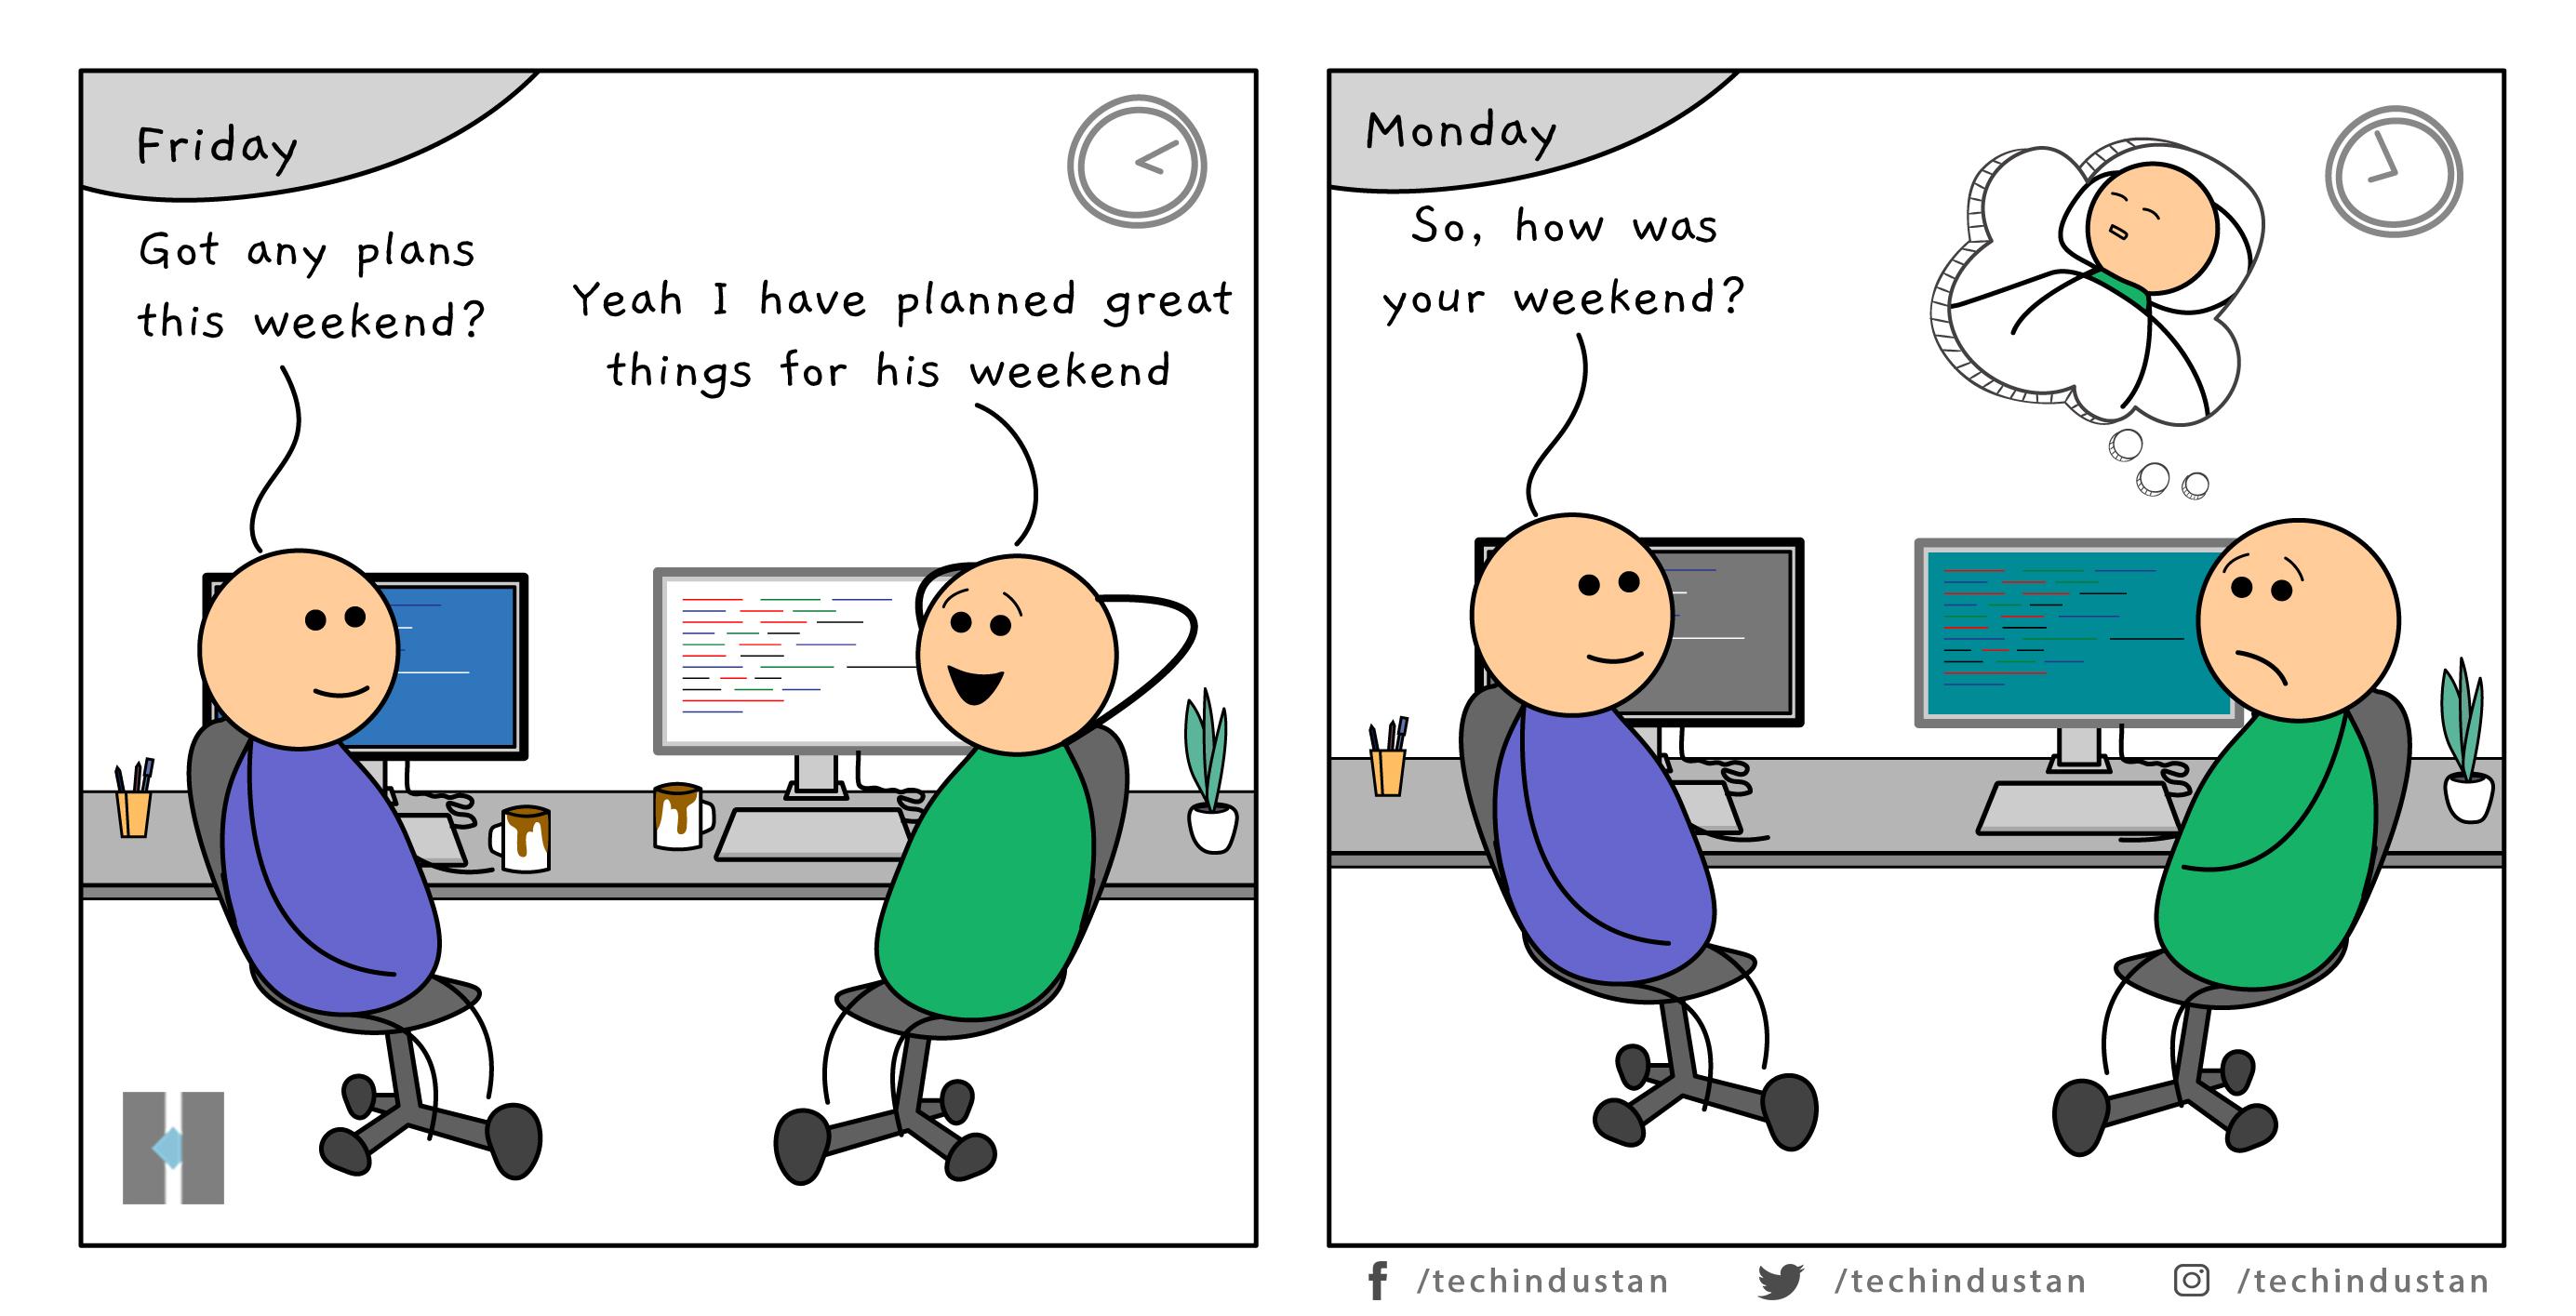 Weekend plan vs reality. How was your weekend? Weekend